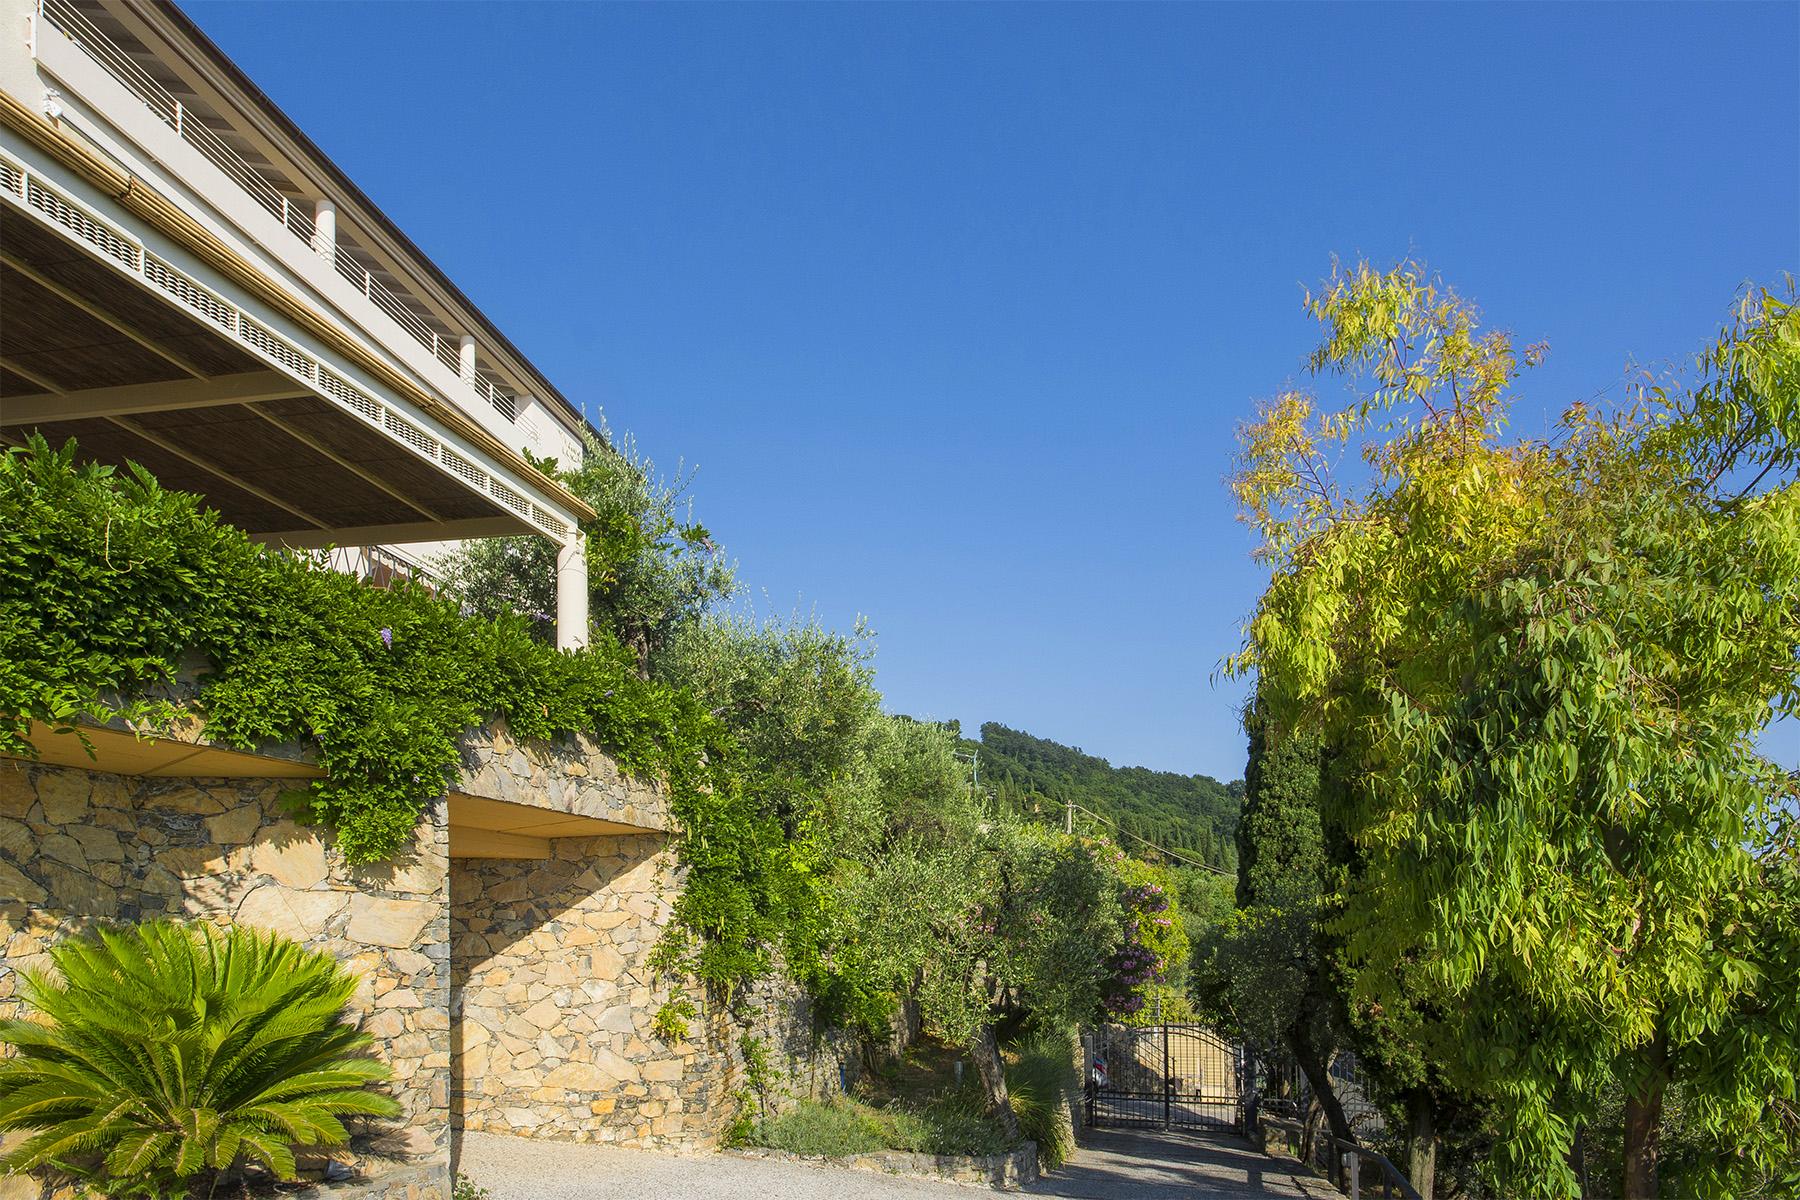 Villa in Vendita a Lerici: 5 locali, 580 mq - Foto 26